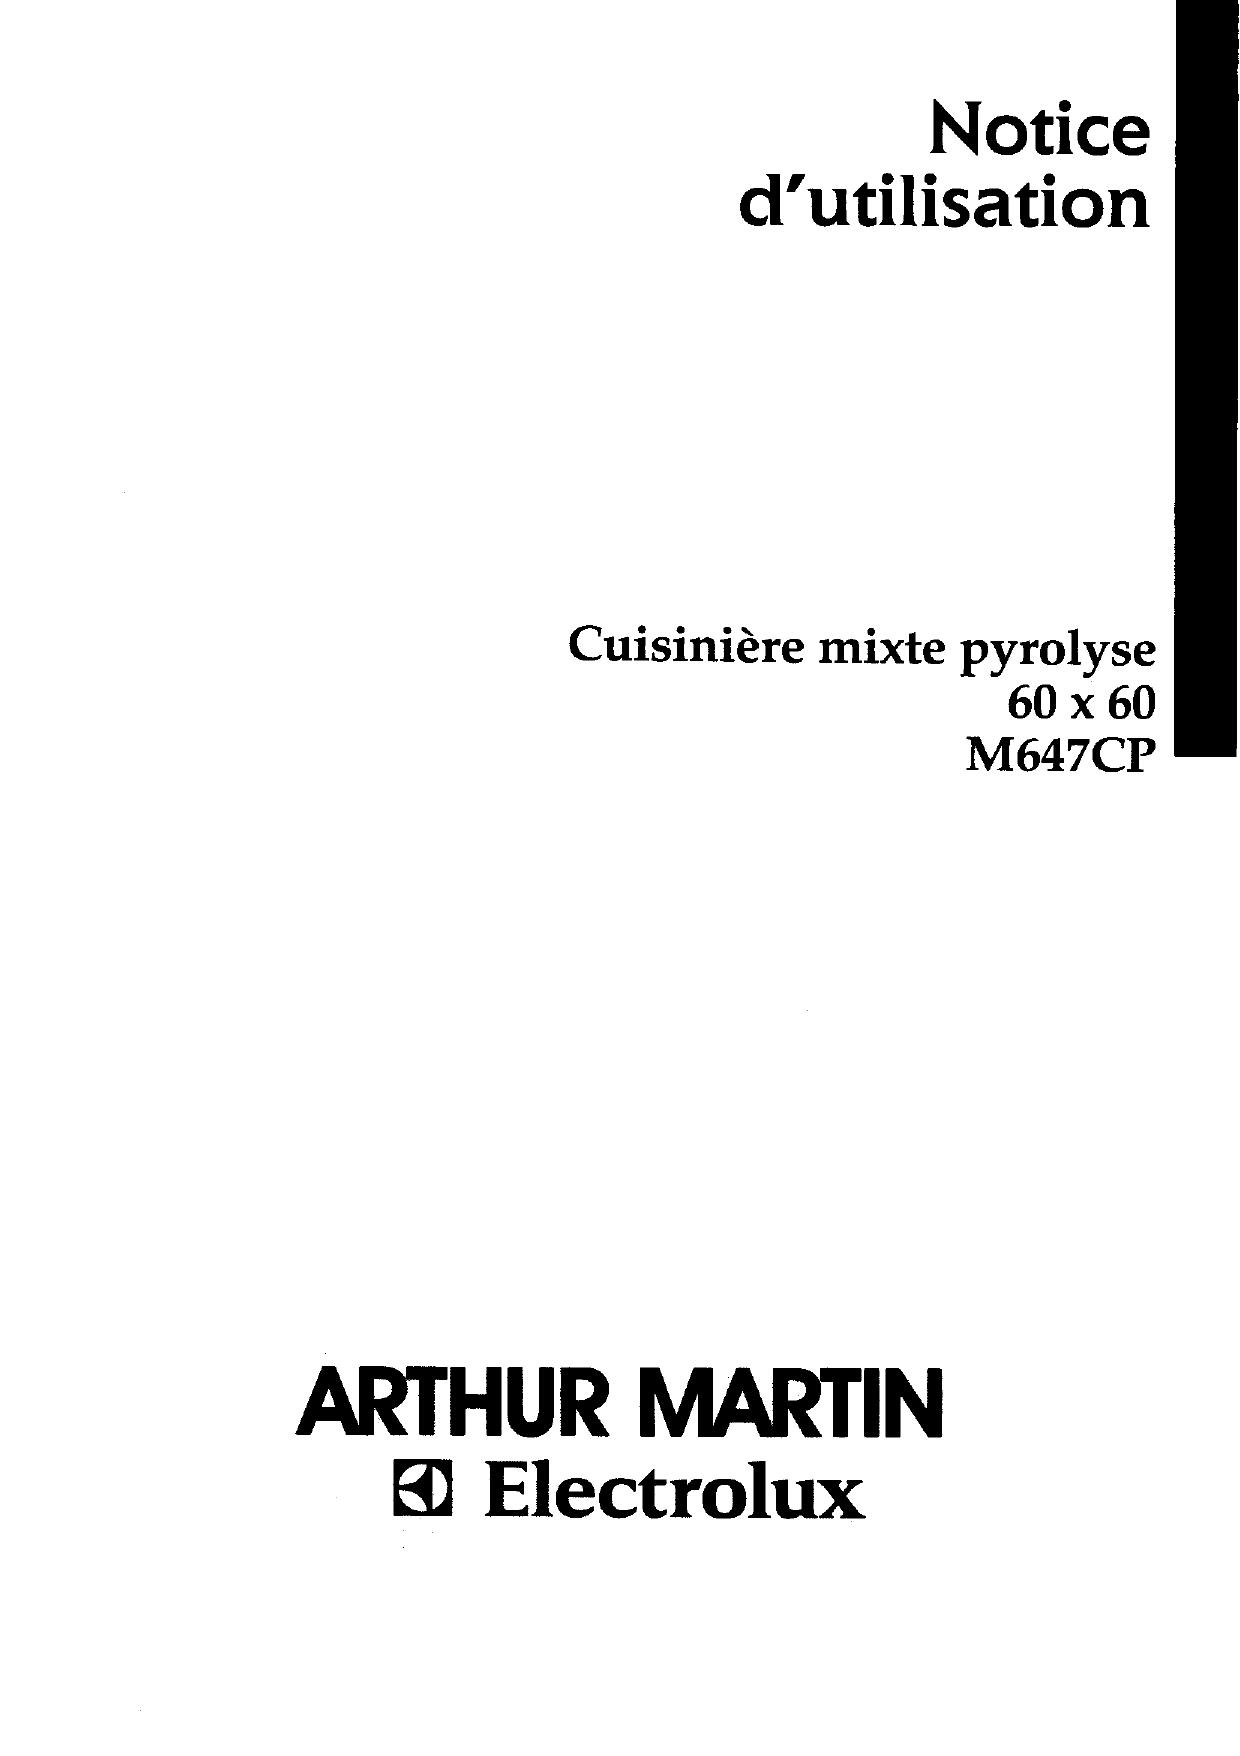 ARTHUR MARTIN ELECTROLUX M647CPN13+1PYRO User manual